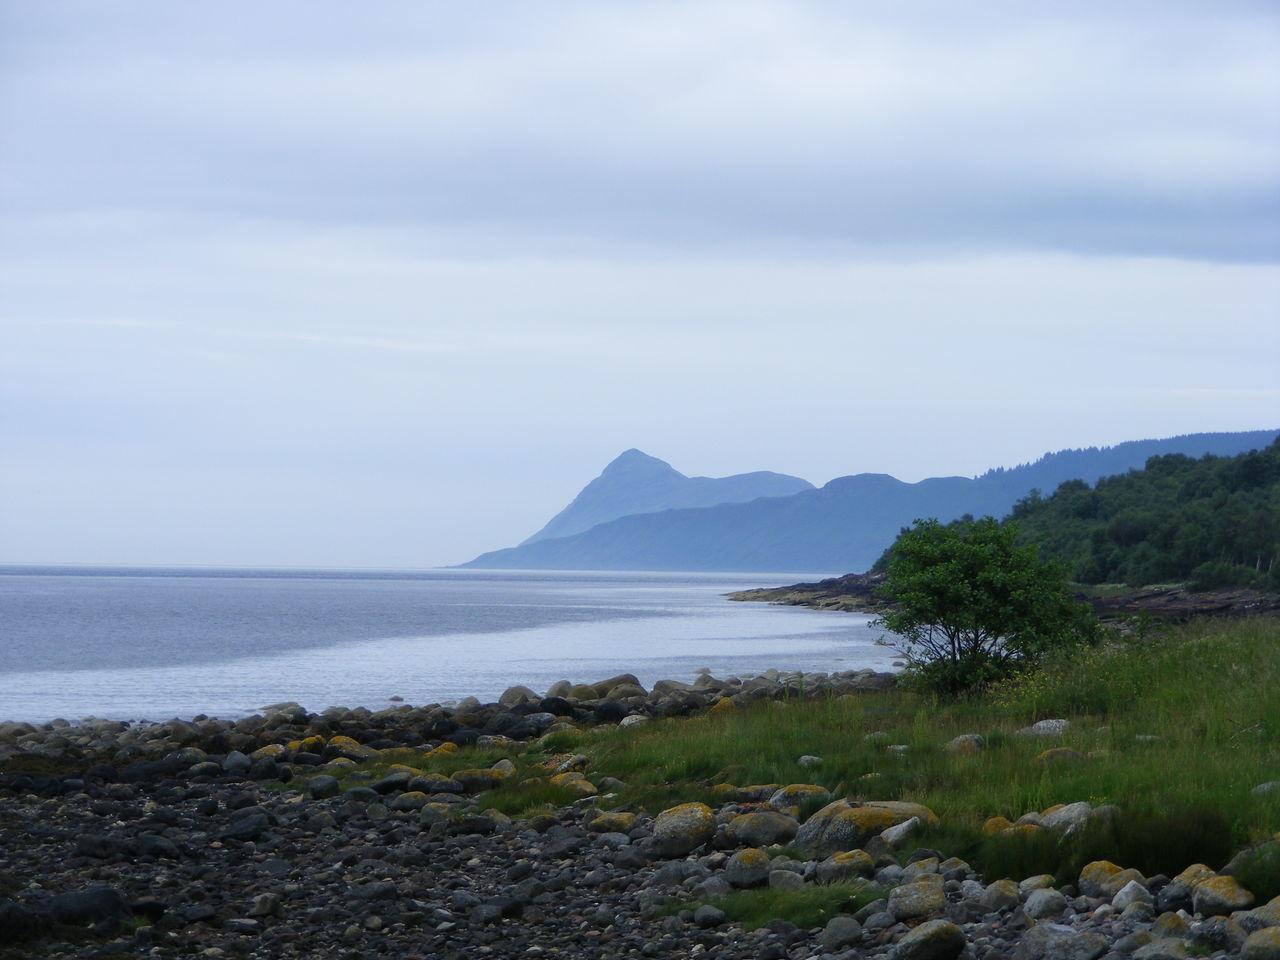 Arran  Beauty In Nature Coastline Idyllic Isle Of Arran  Nature Scenics Scotland Sky Stones Tranquil Scene Tranquility